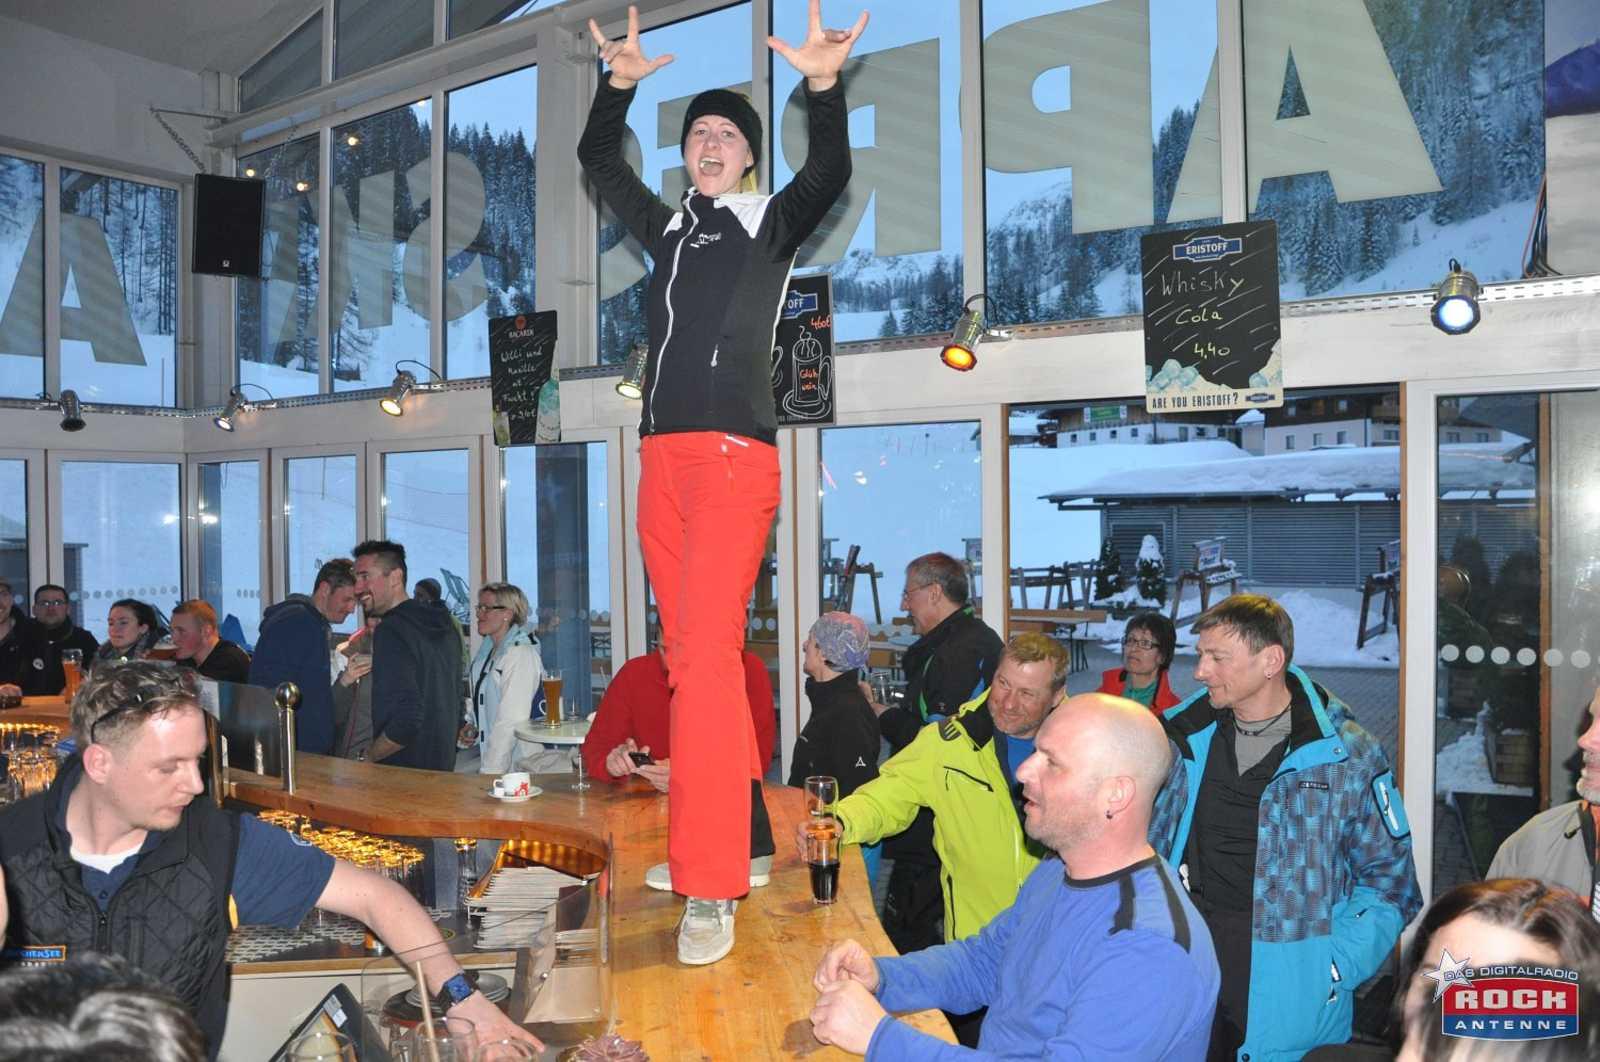 ROCK THE MOUNTAIN Zauchensee, 11.03.2017 | ROCK ANTENNE